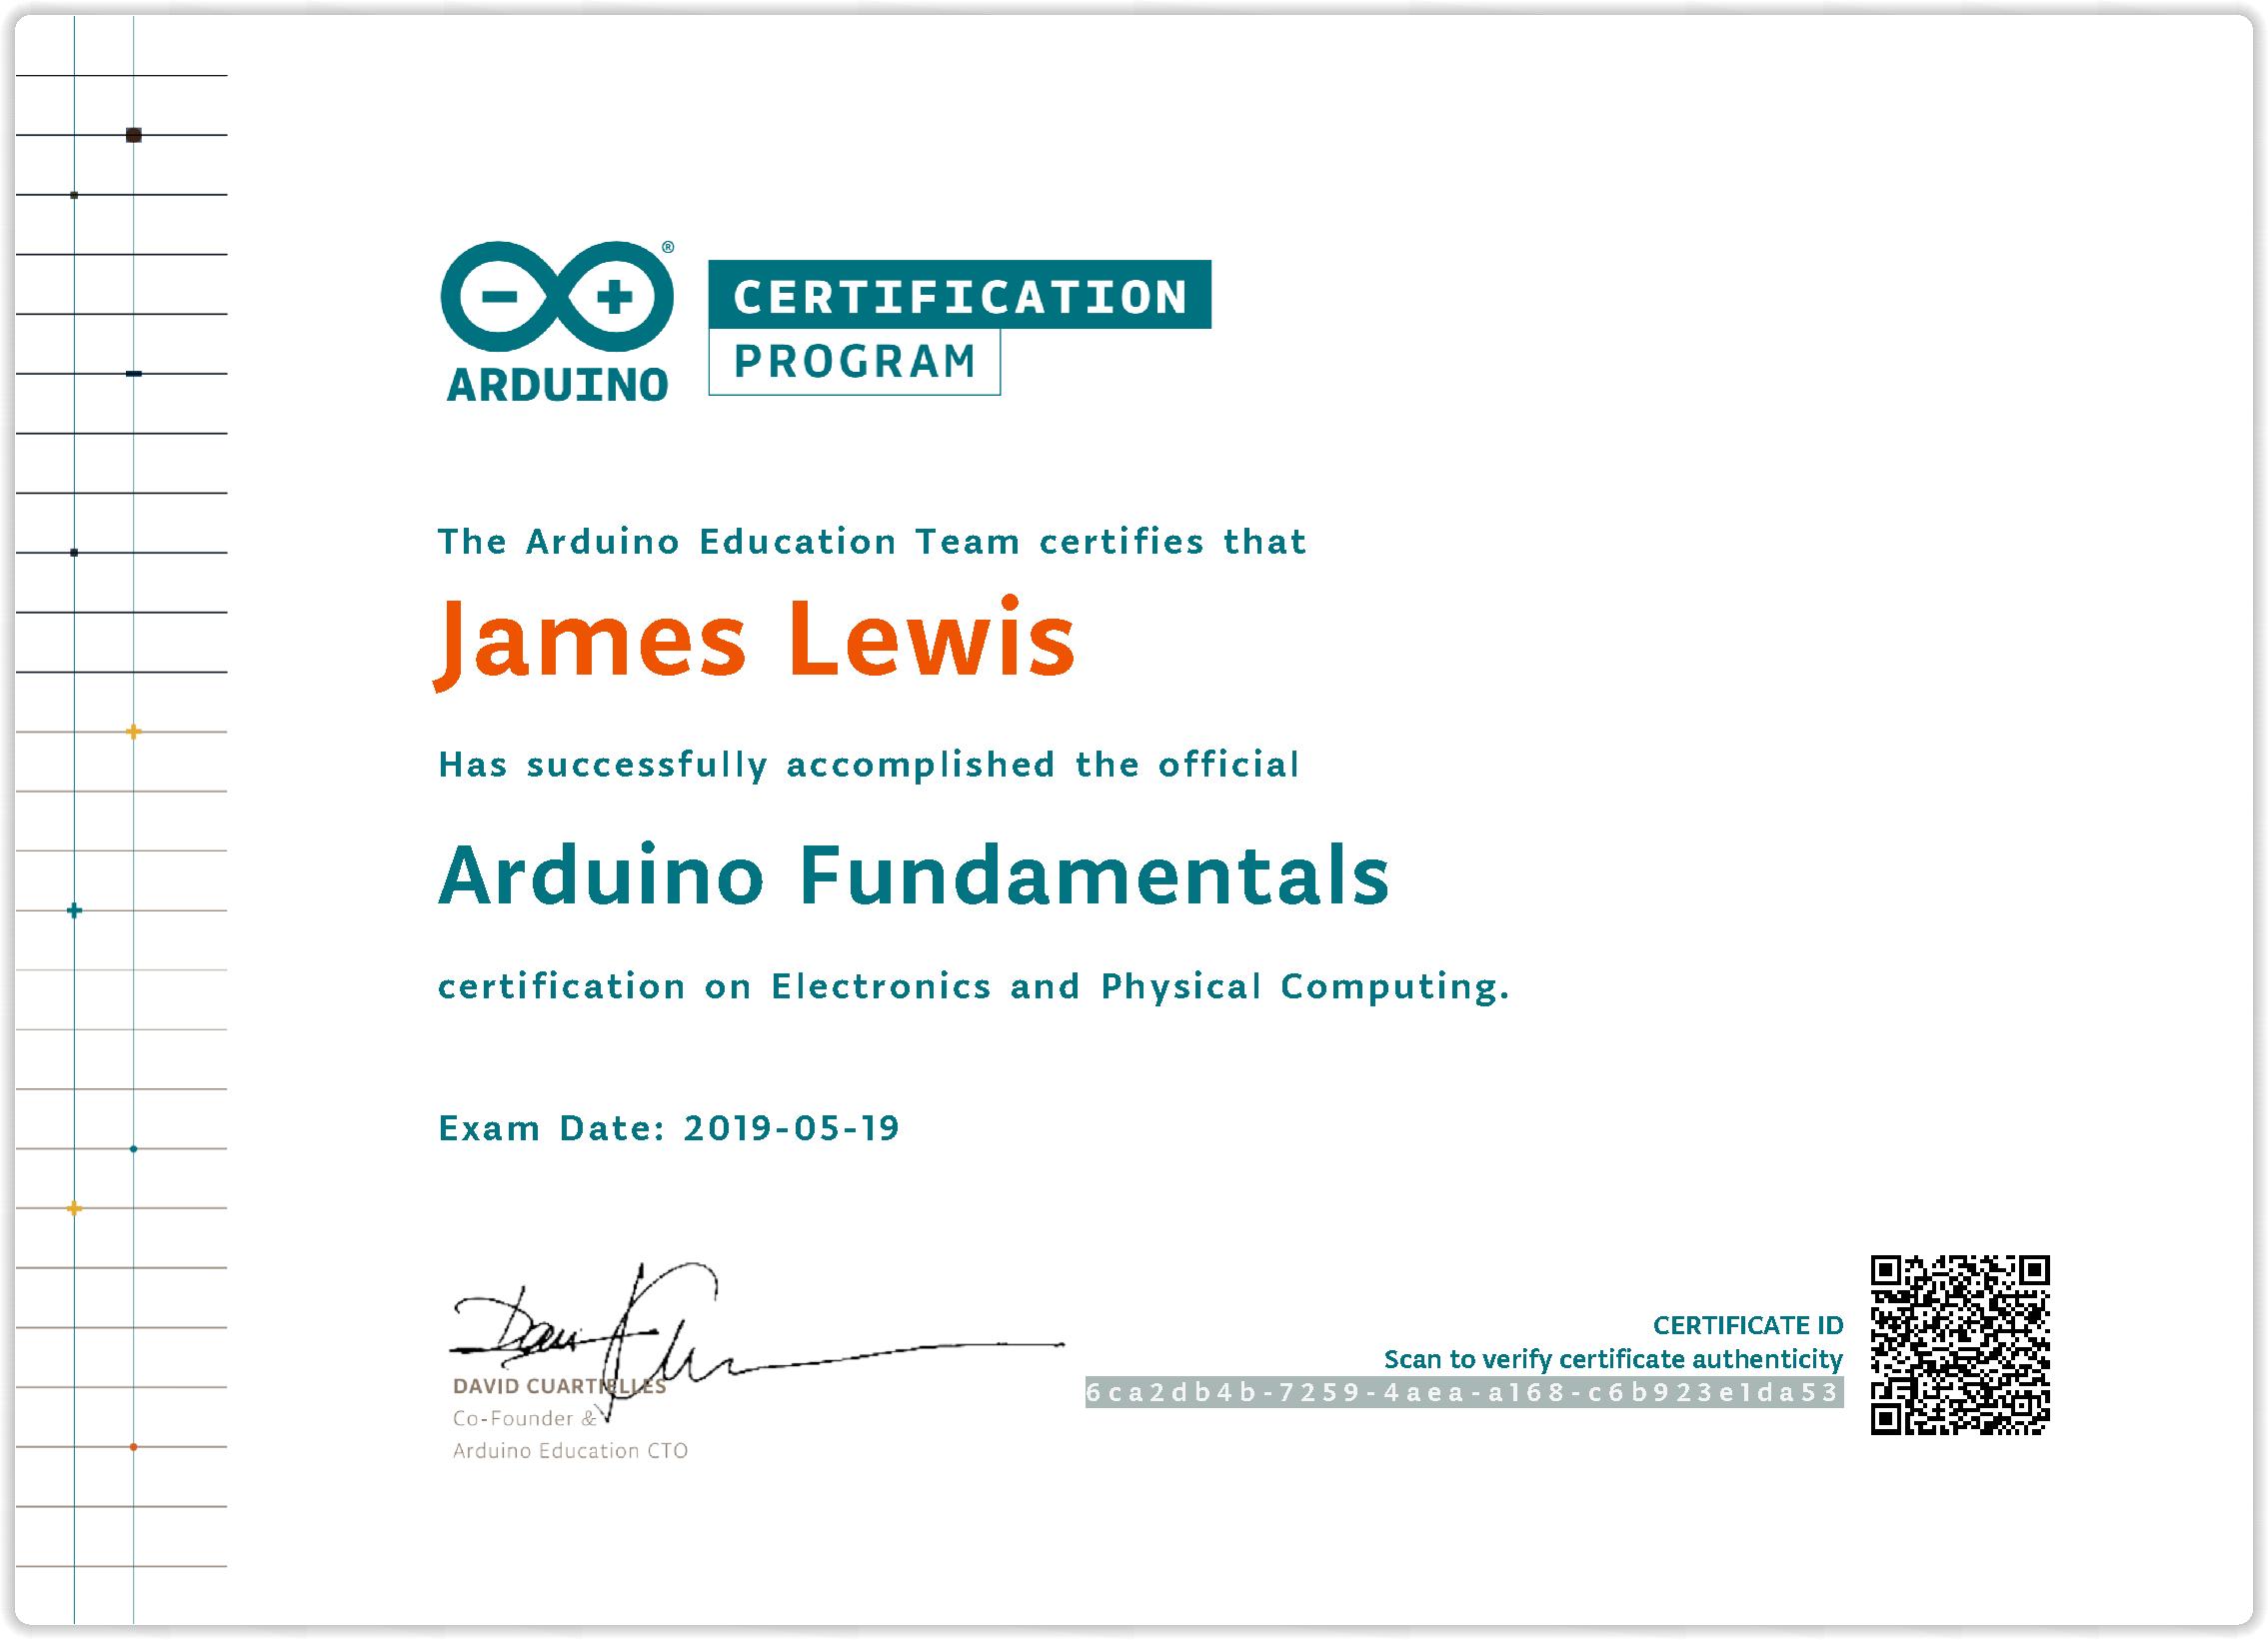 Bald Engineer's Arduino Fundamentals Certification